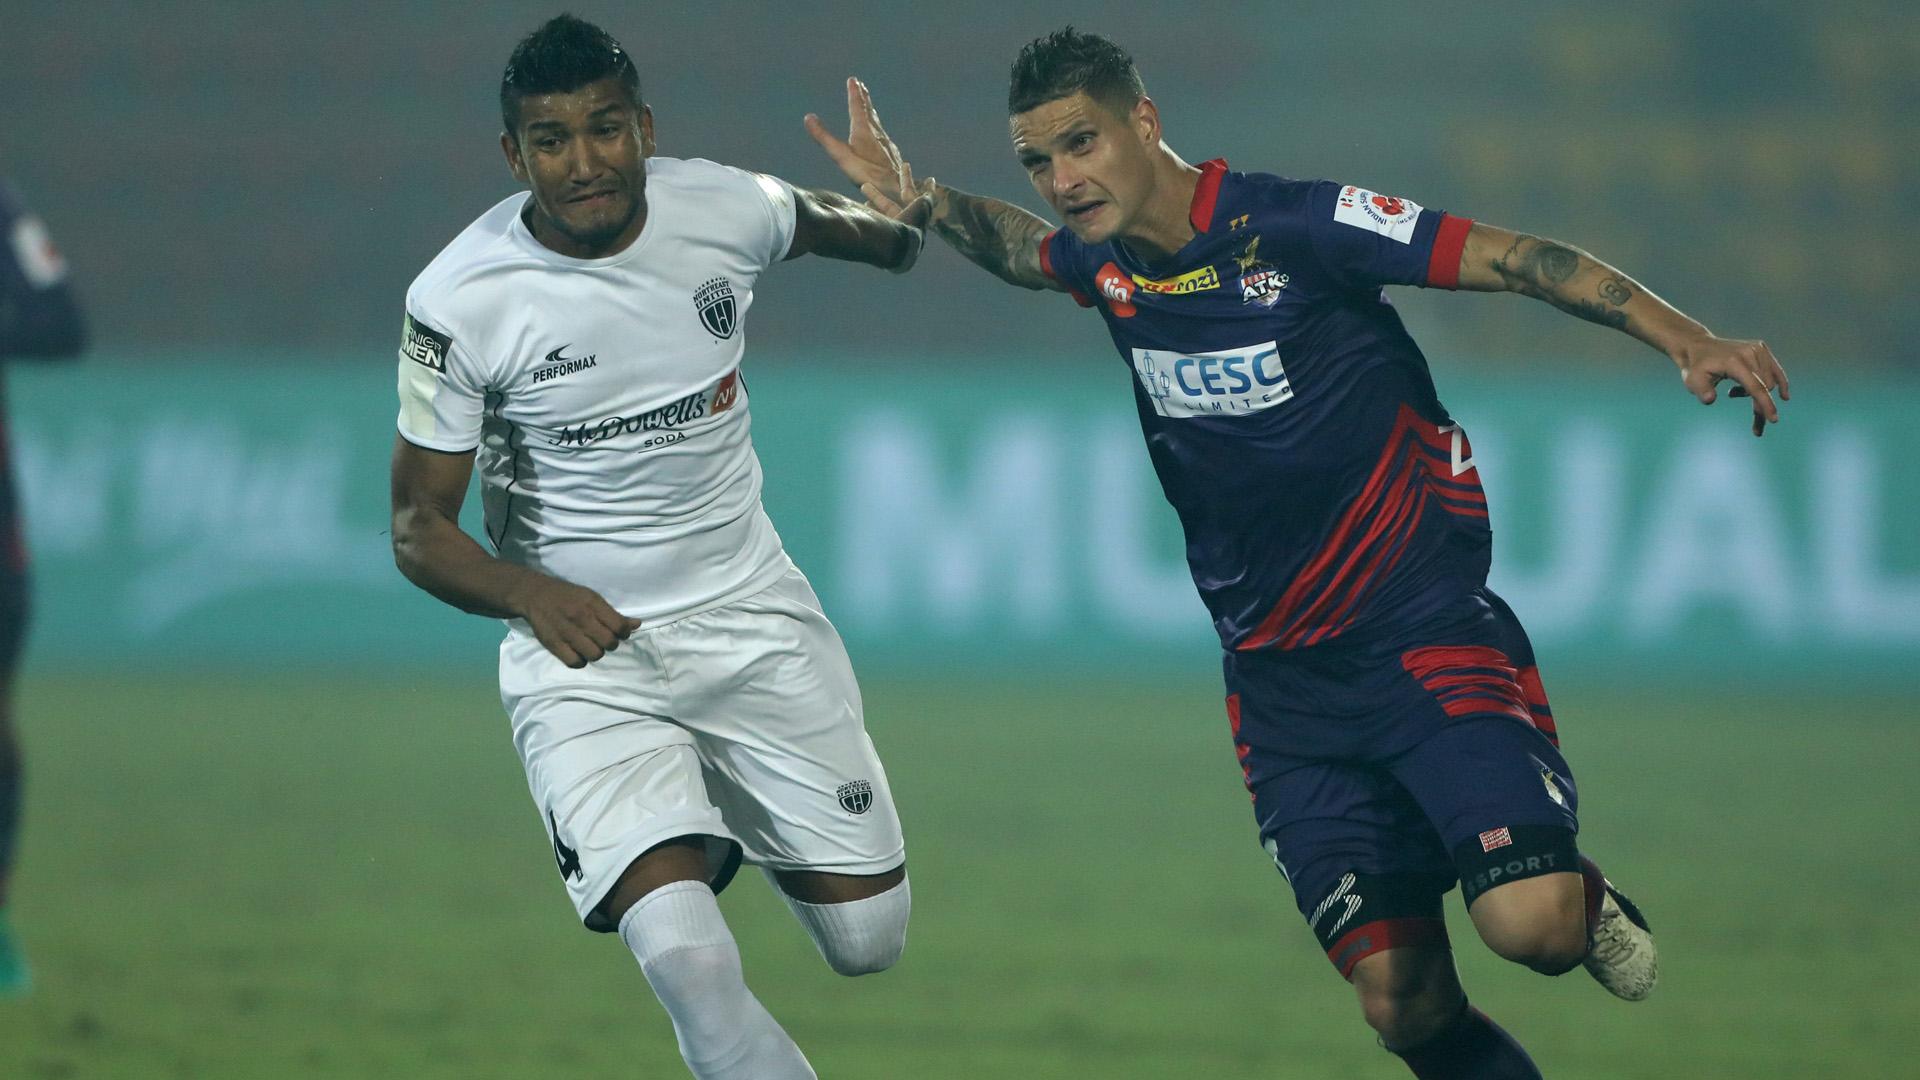 Nirmal Chettri Zequinha NorthEast United FC ATK ISL 4 2017/2018